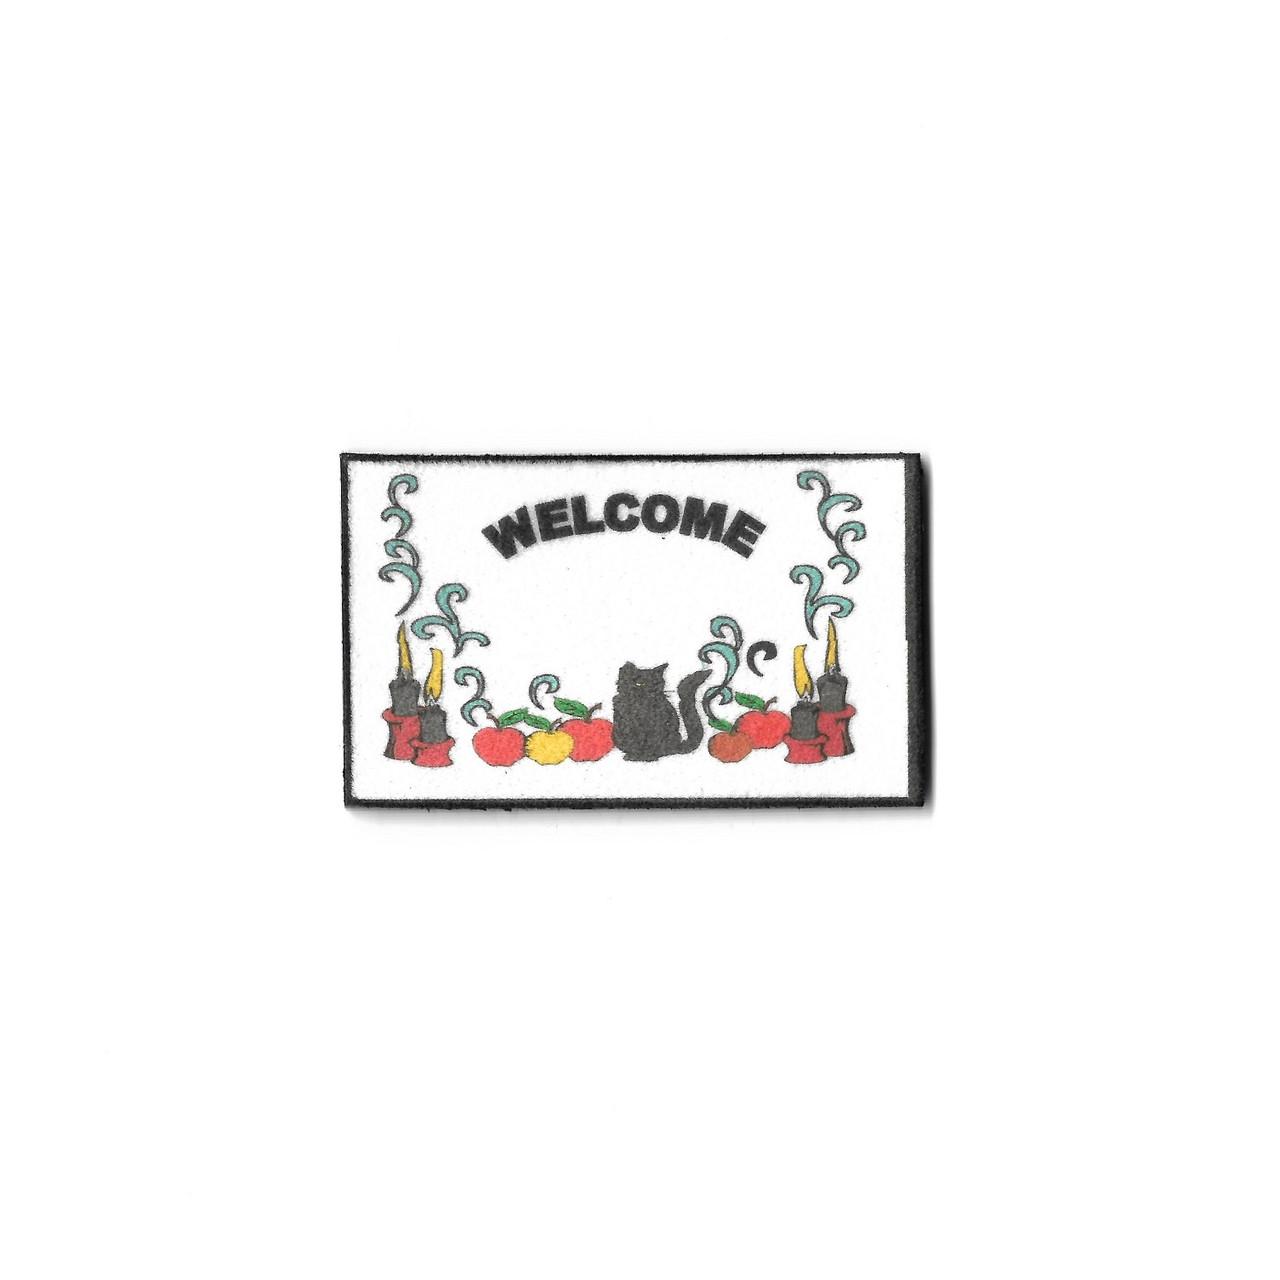 Dollhouse Miniature Doormat, Halloween Cats Welcome (SMSHW475BA)